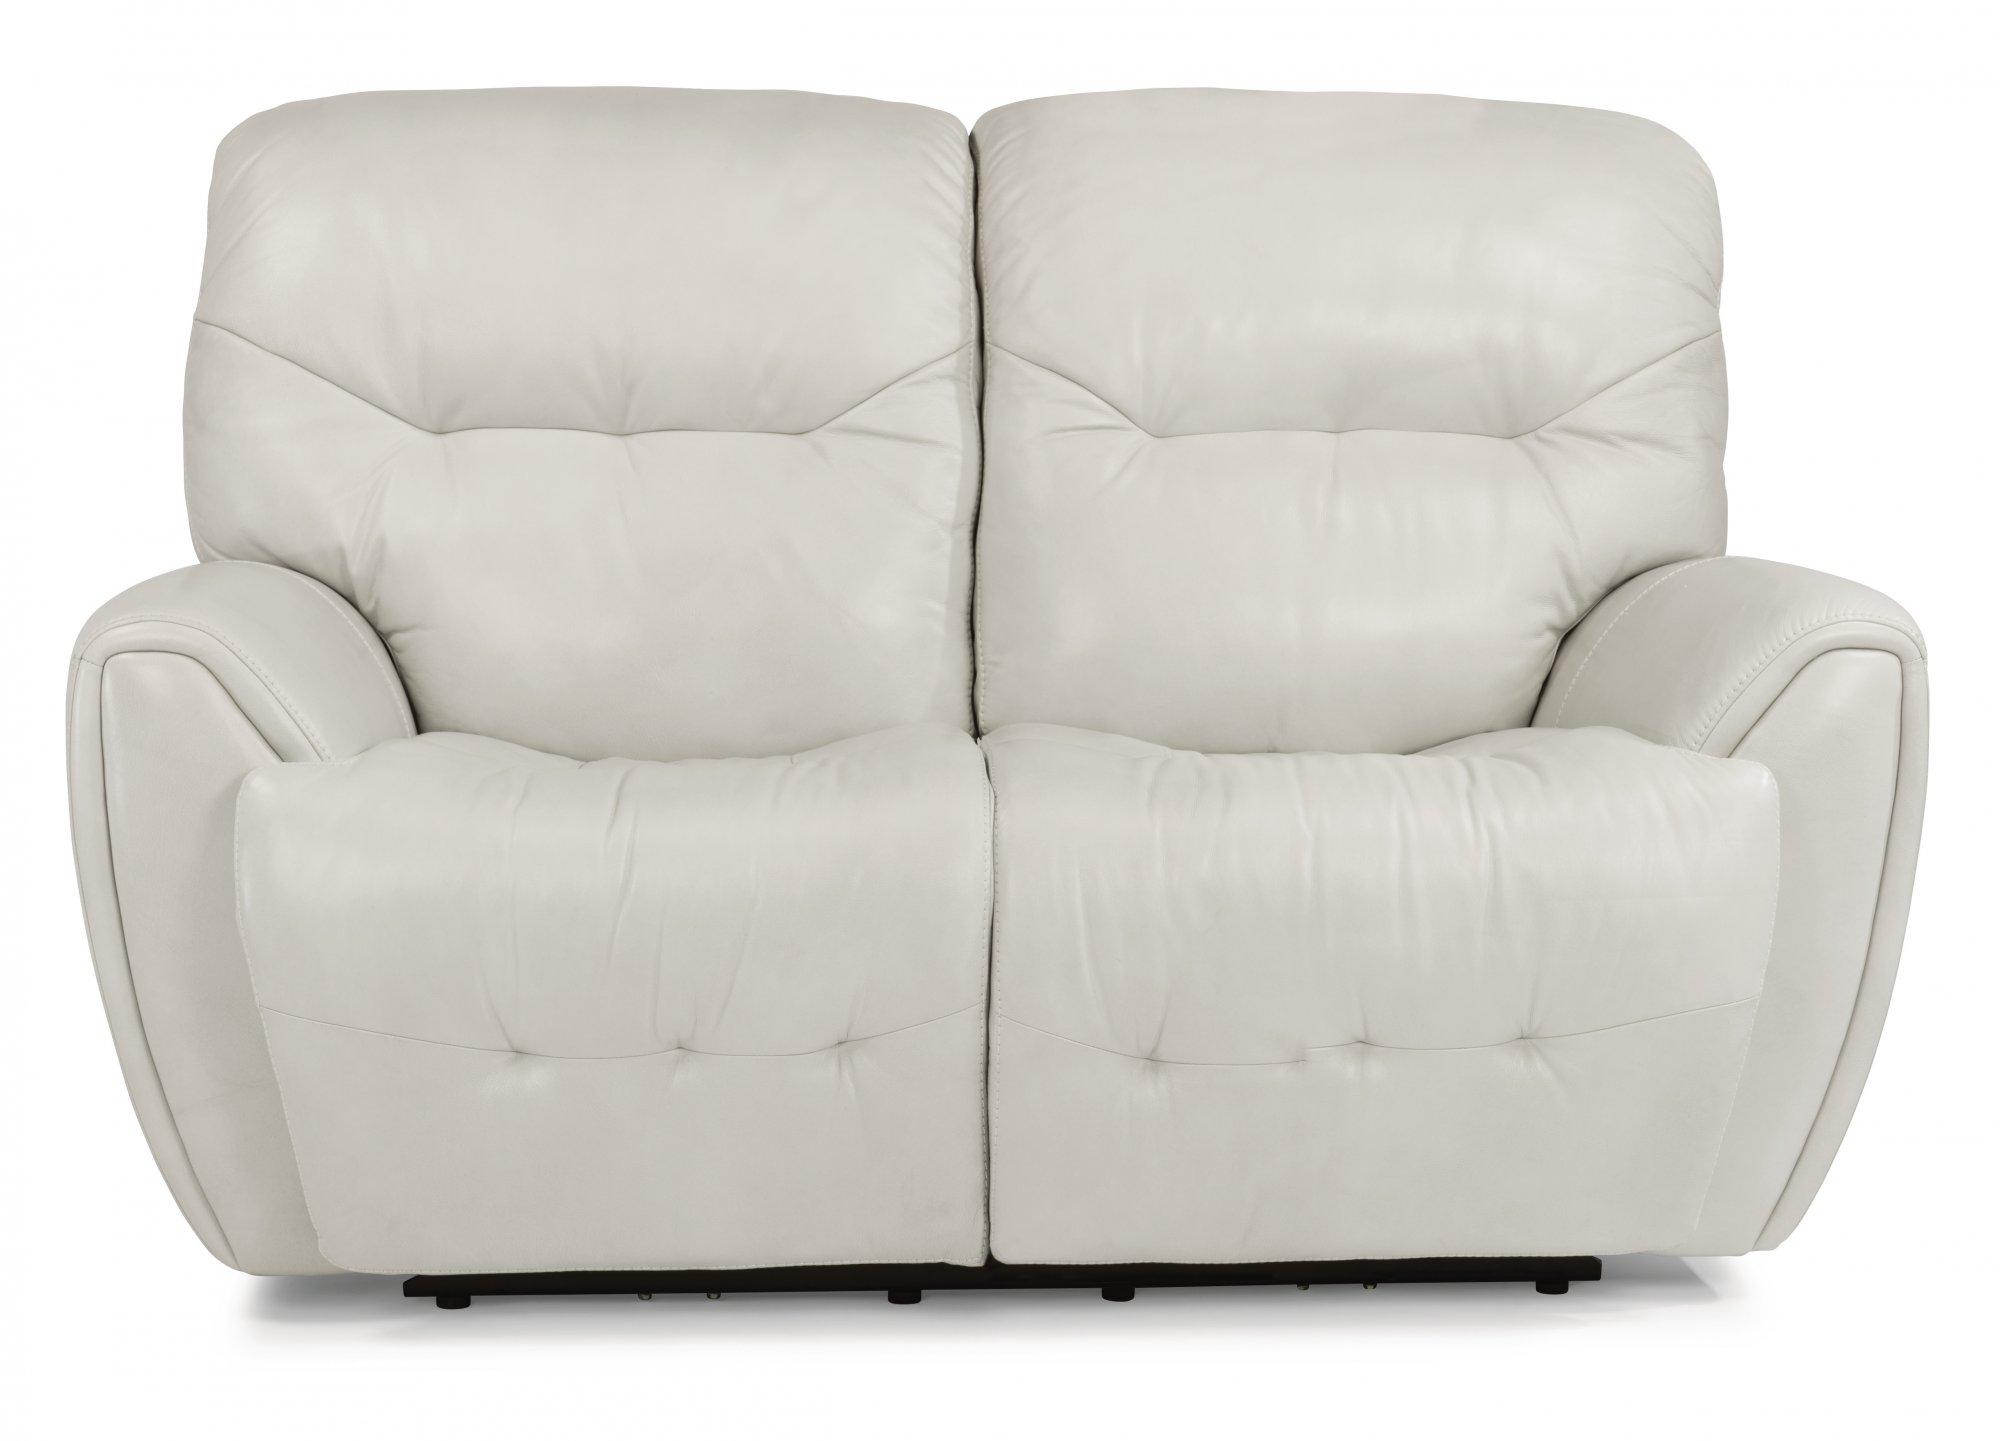 Stupendous Reclining Sofas Machost Co Dining Chair Design Ideas Machostcouk